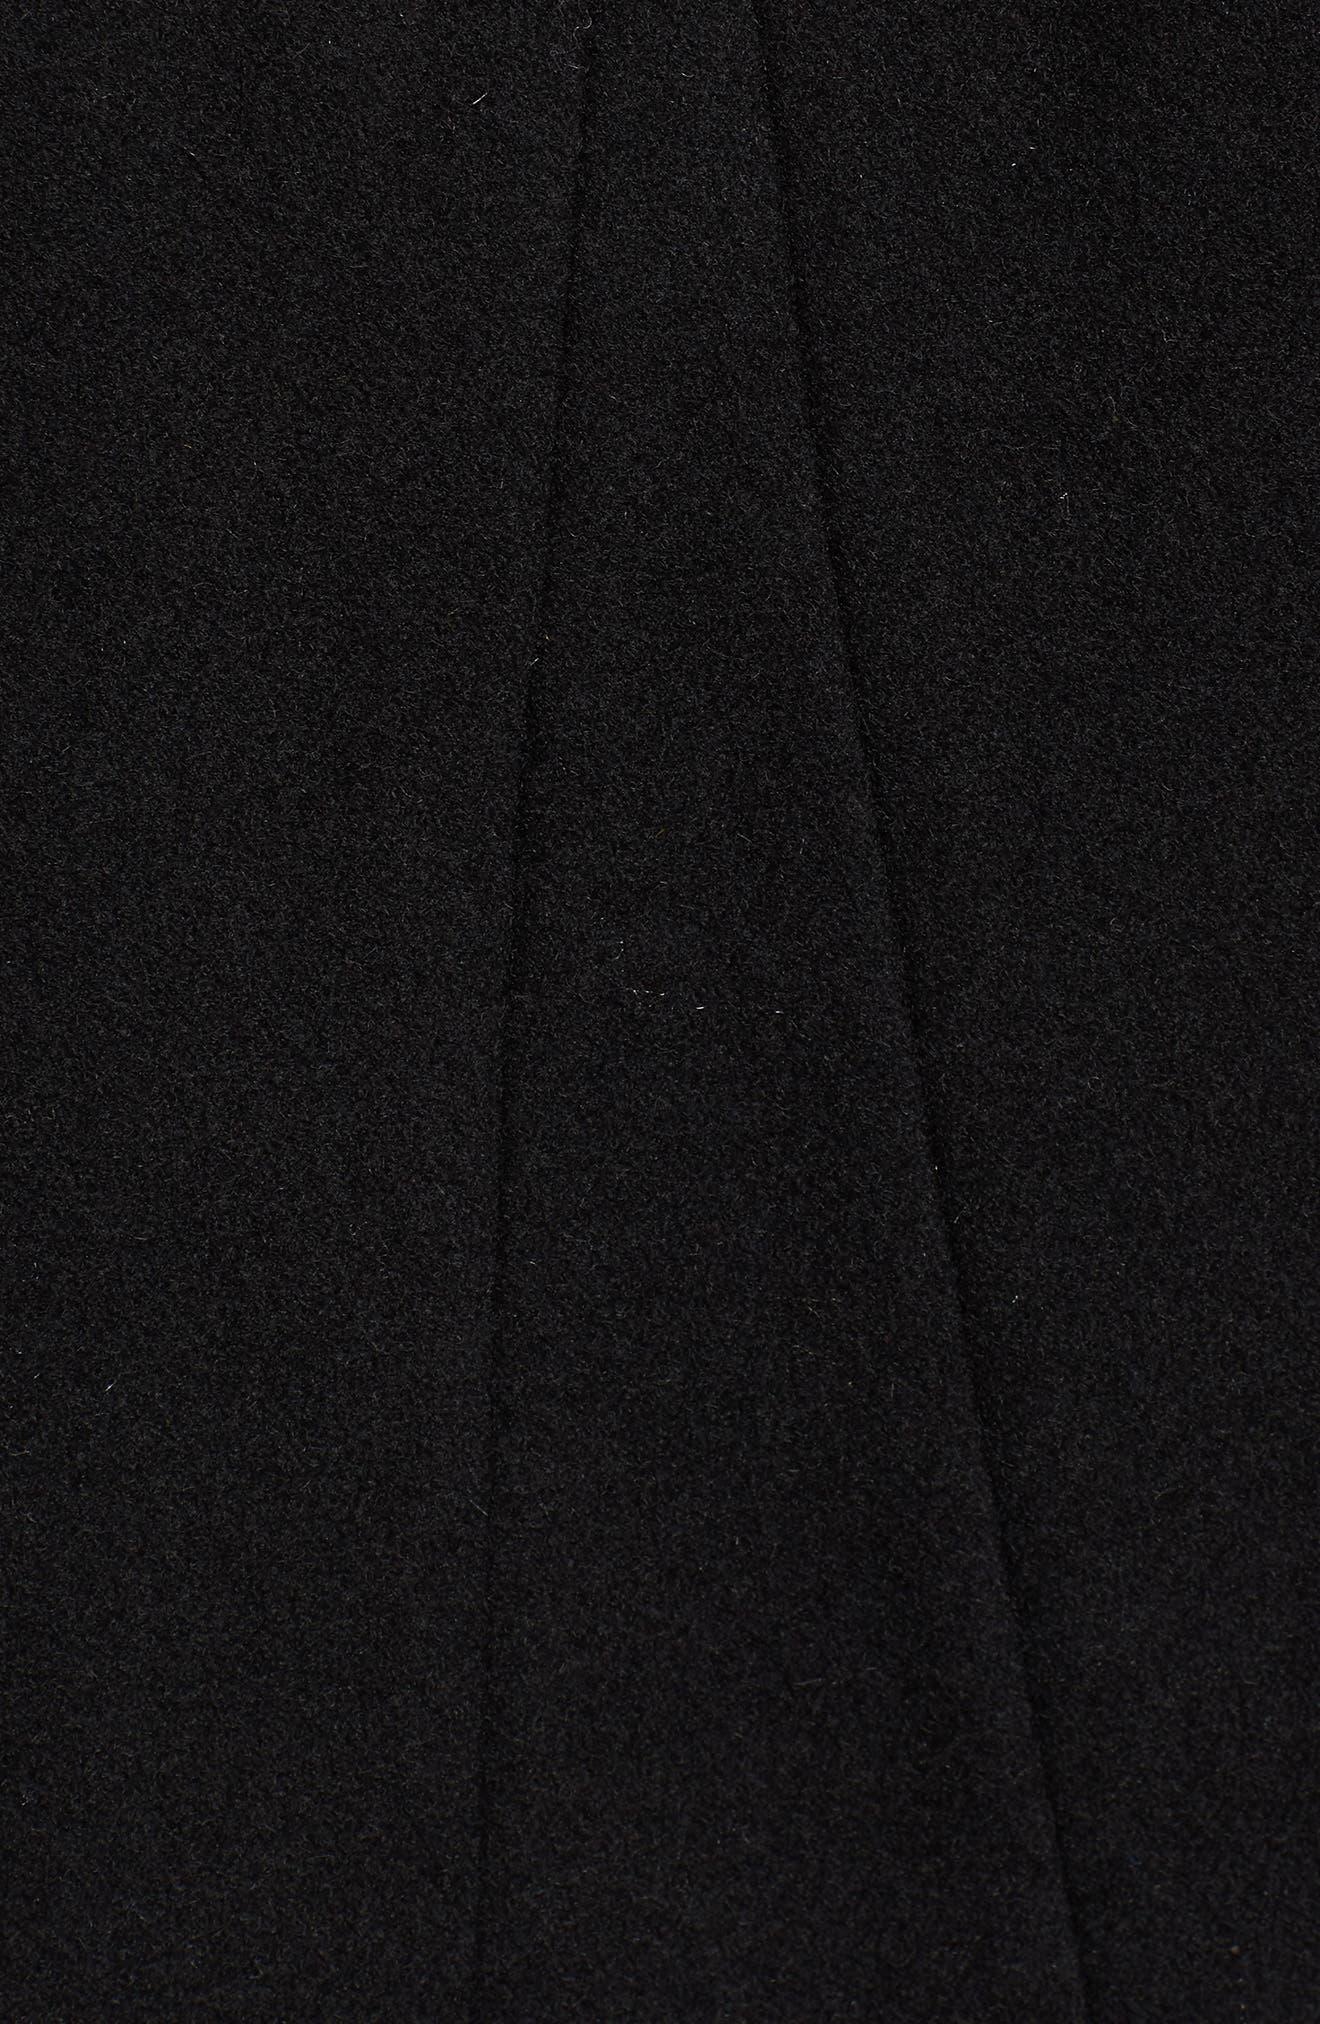 Convertible 3-in-1 Maternity/Nursing Coat,                             Alternate thumbnail 7, color,                             Black